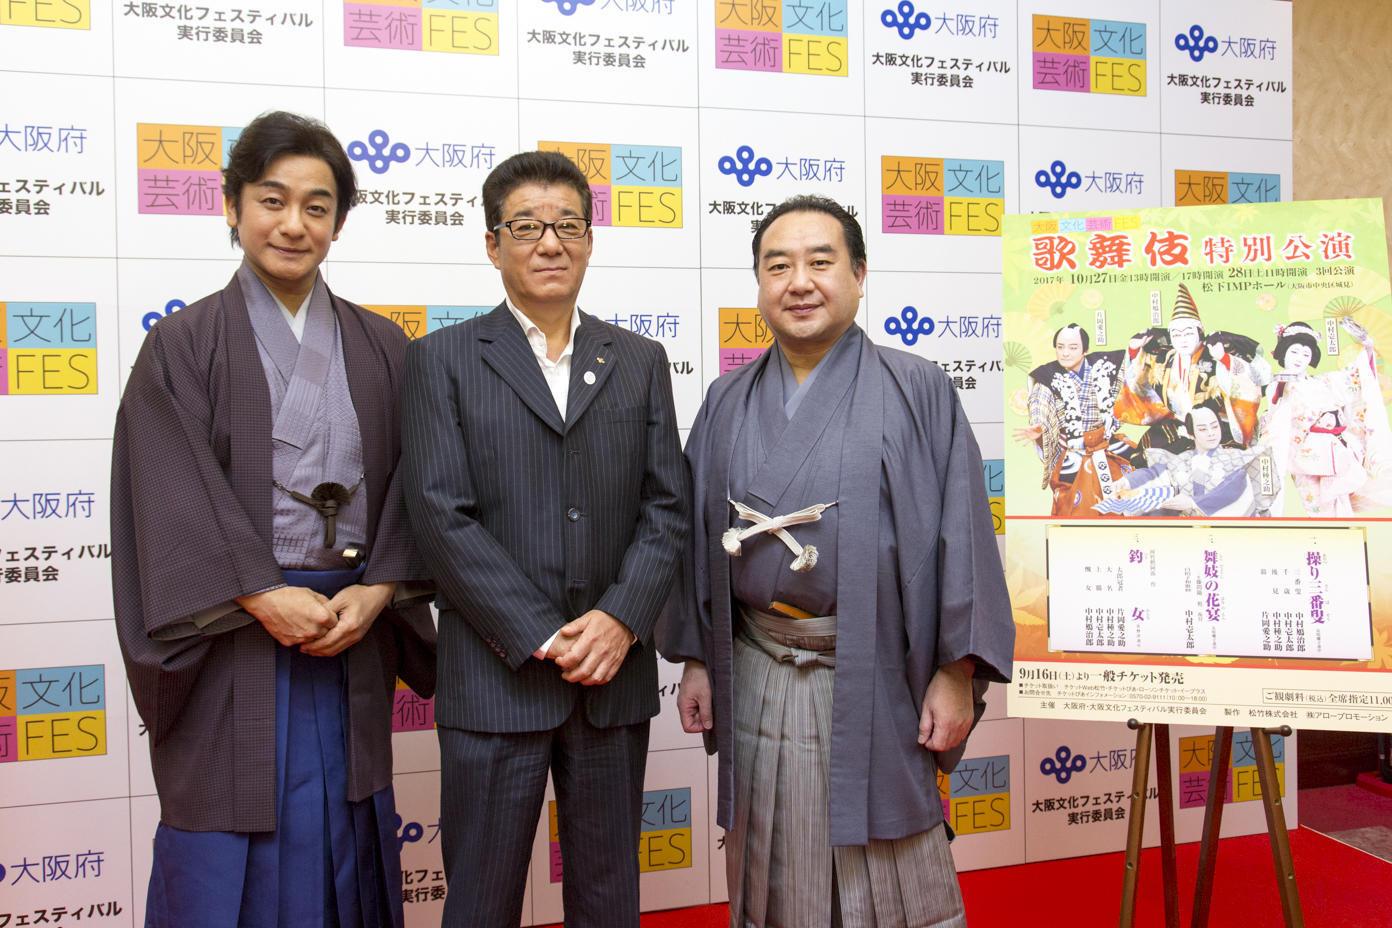 http://news.yoshimoto.co.jp/20170905233051-19e87a3accfeaae8b9d0955577cd414673816681.jpg